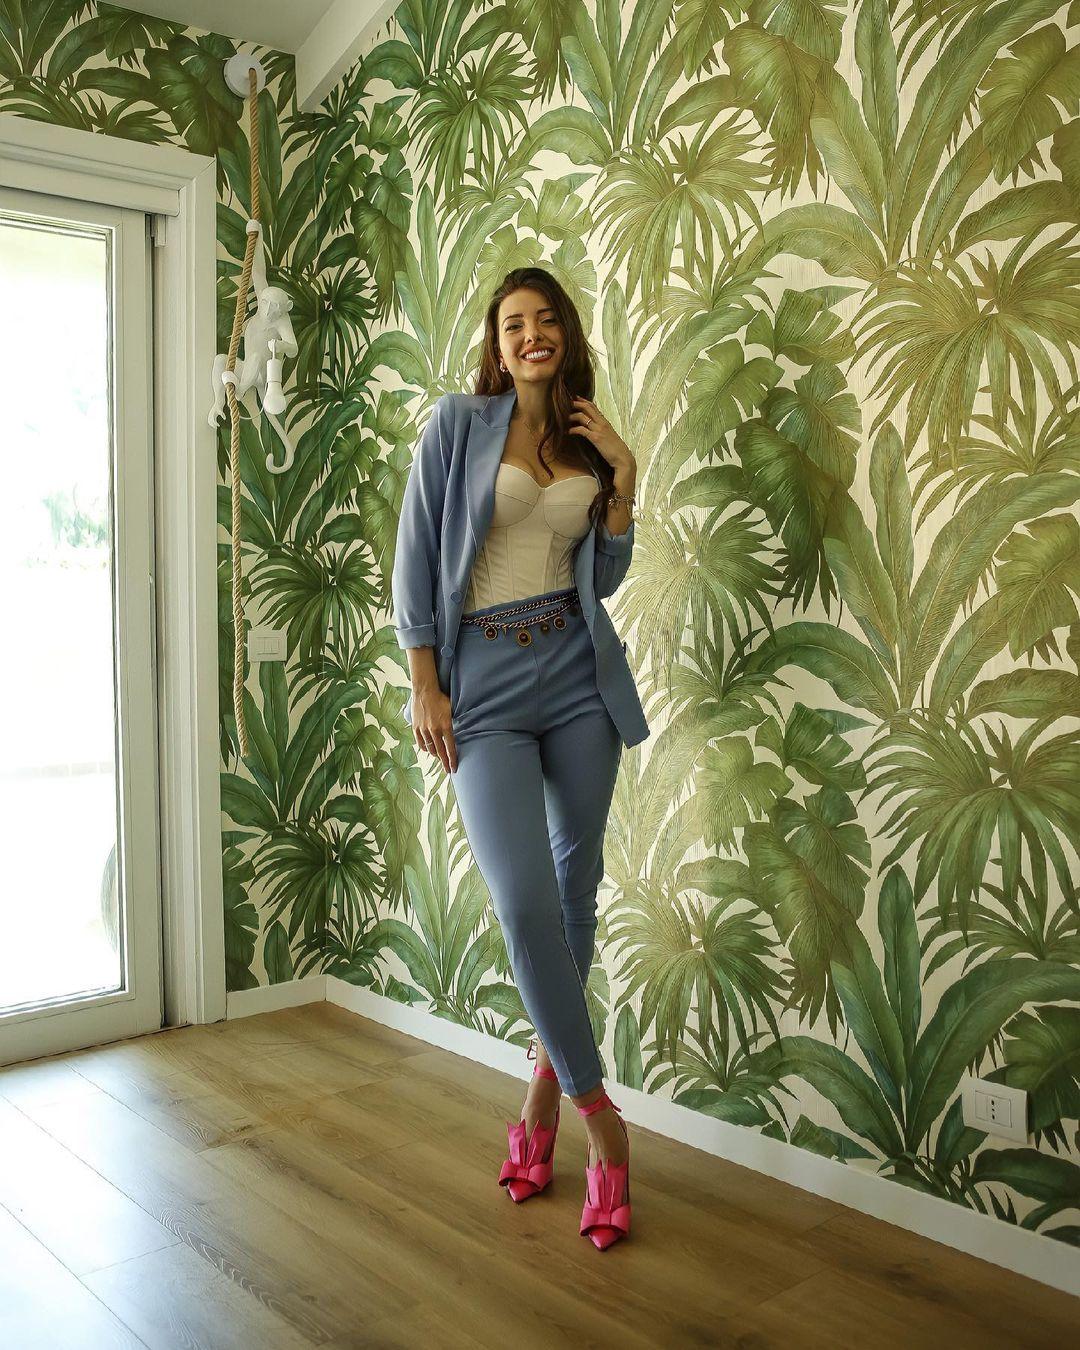 Clarissa-Marchese-Wallpapers-Insta-Fit-Bio-11